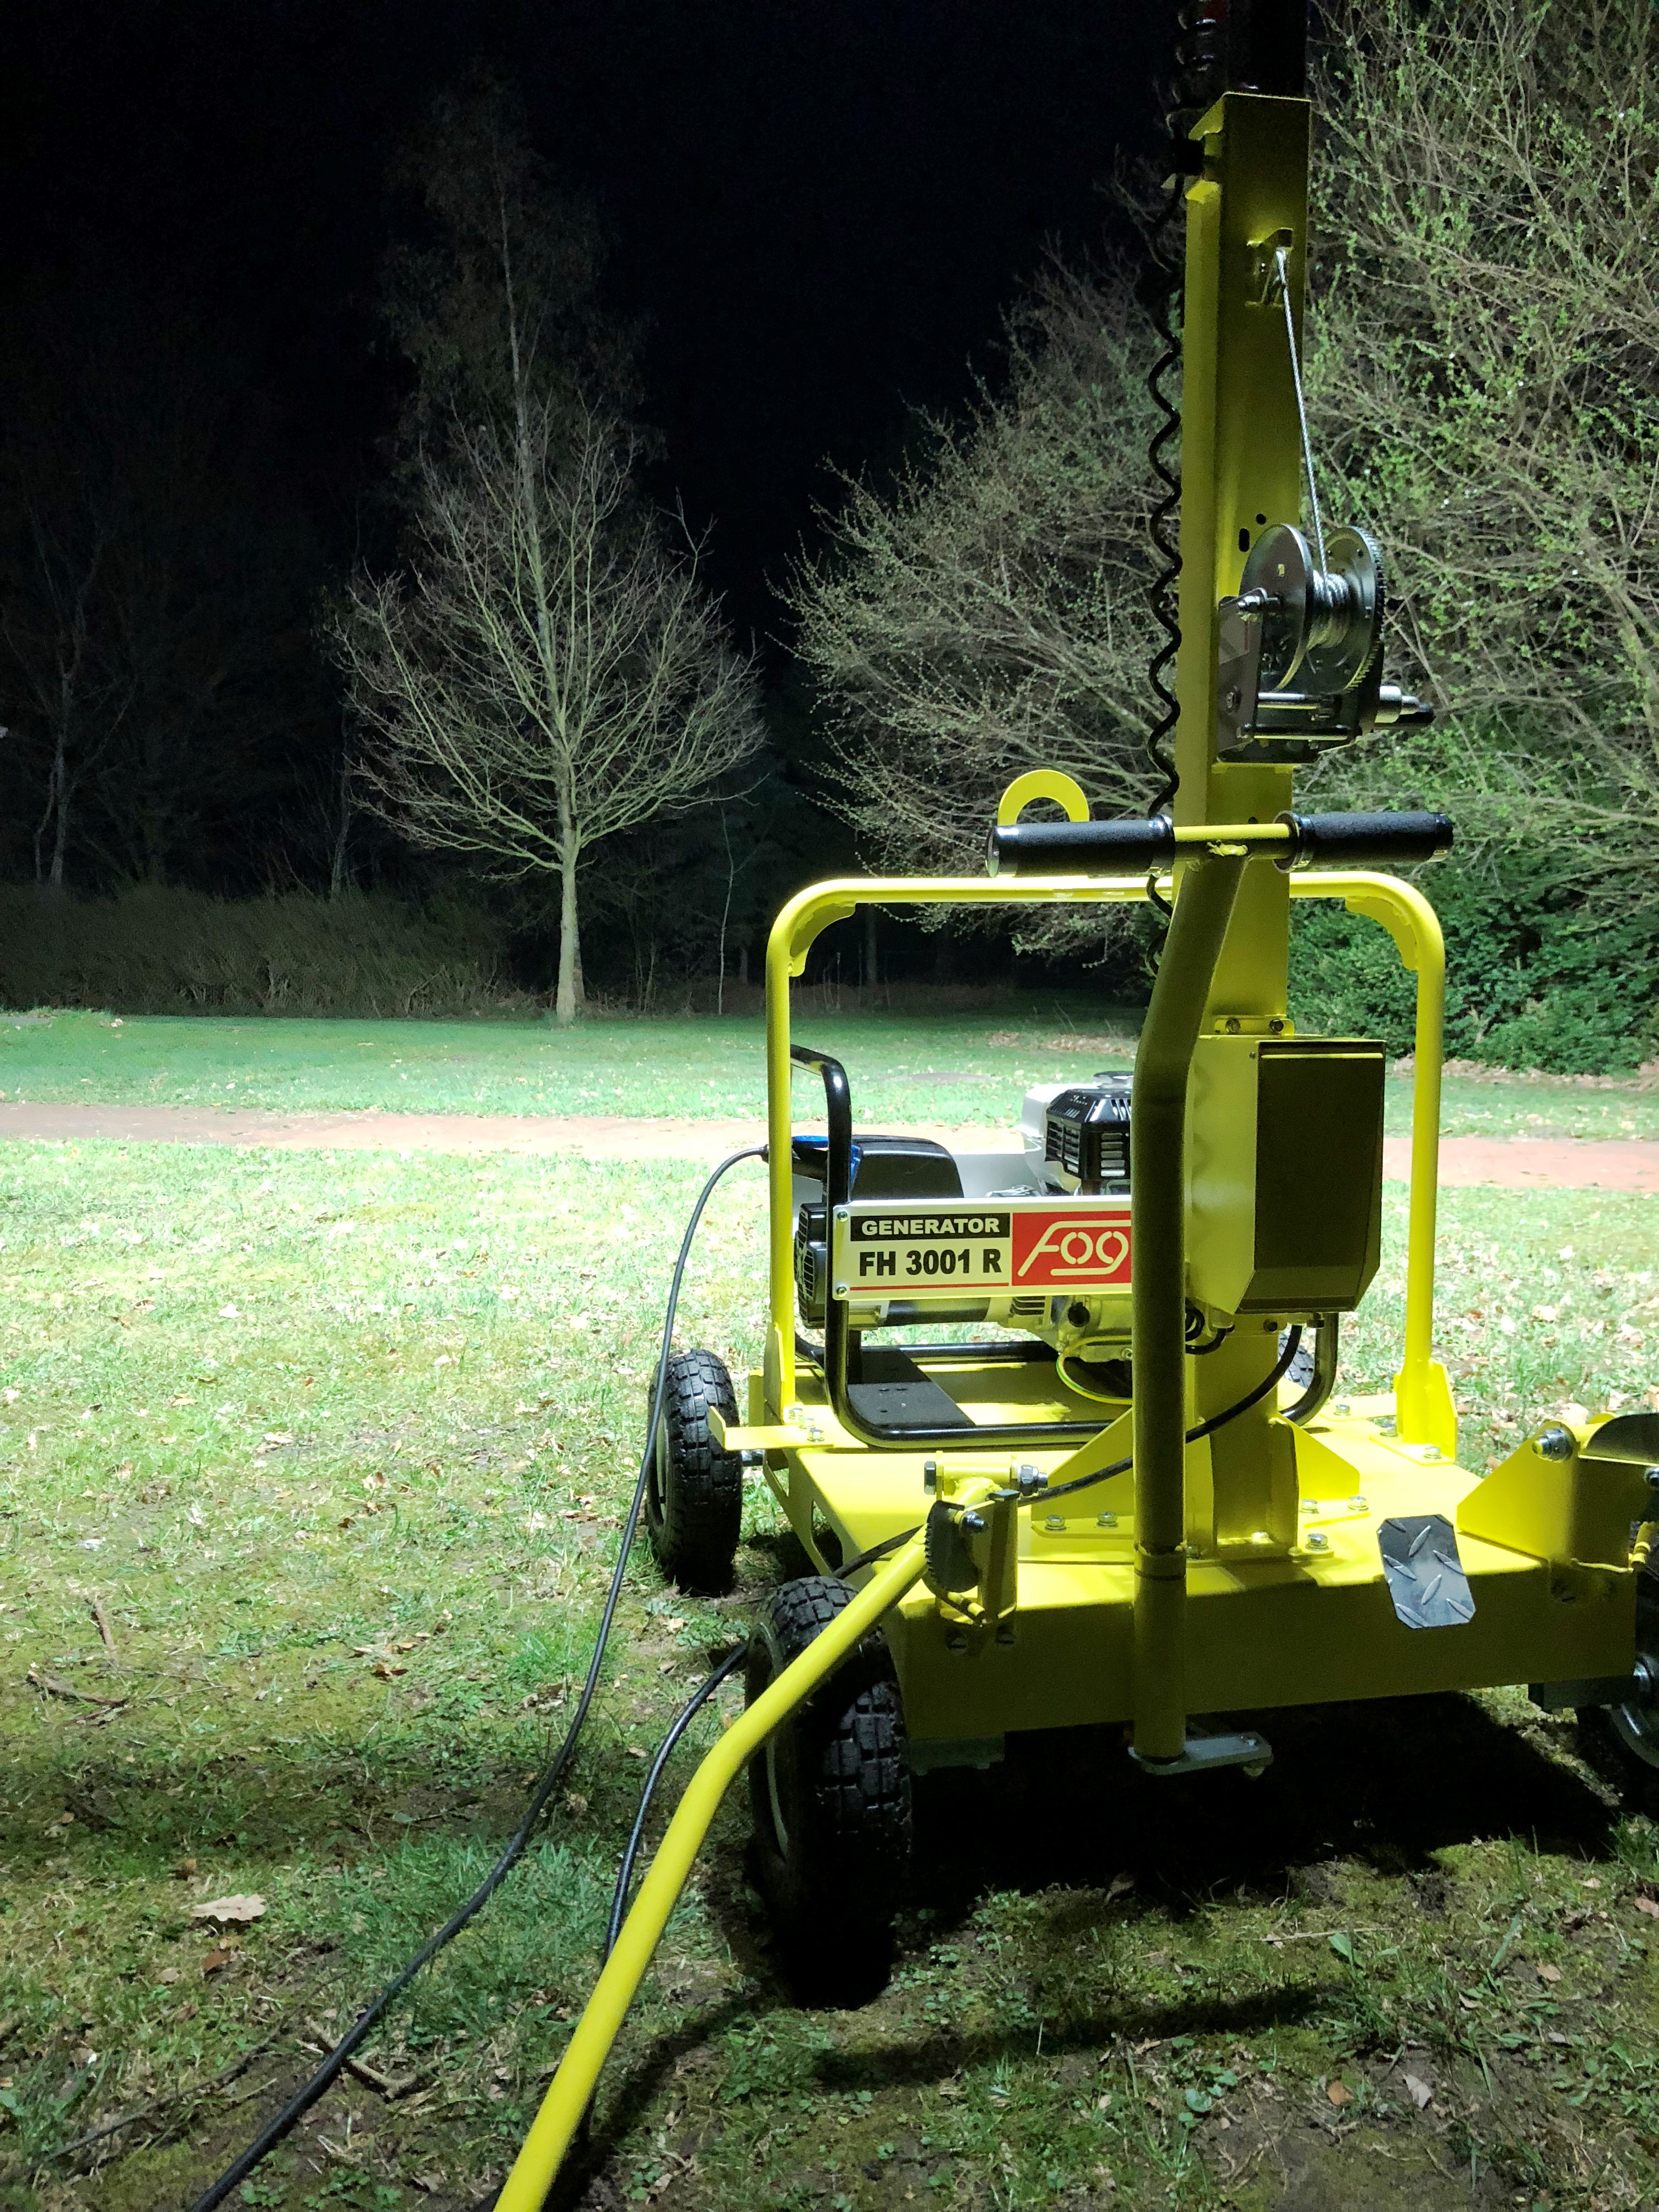 LICHTMAST LT600-LED KOMPAK für 2.500 m² Baustellenbeleuchtung